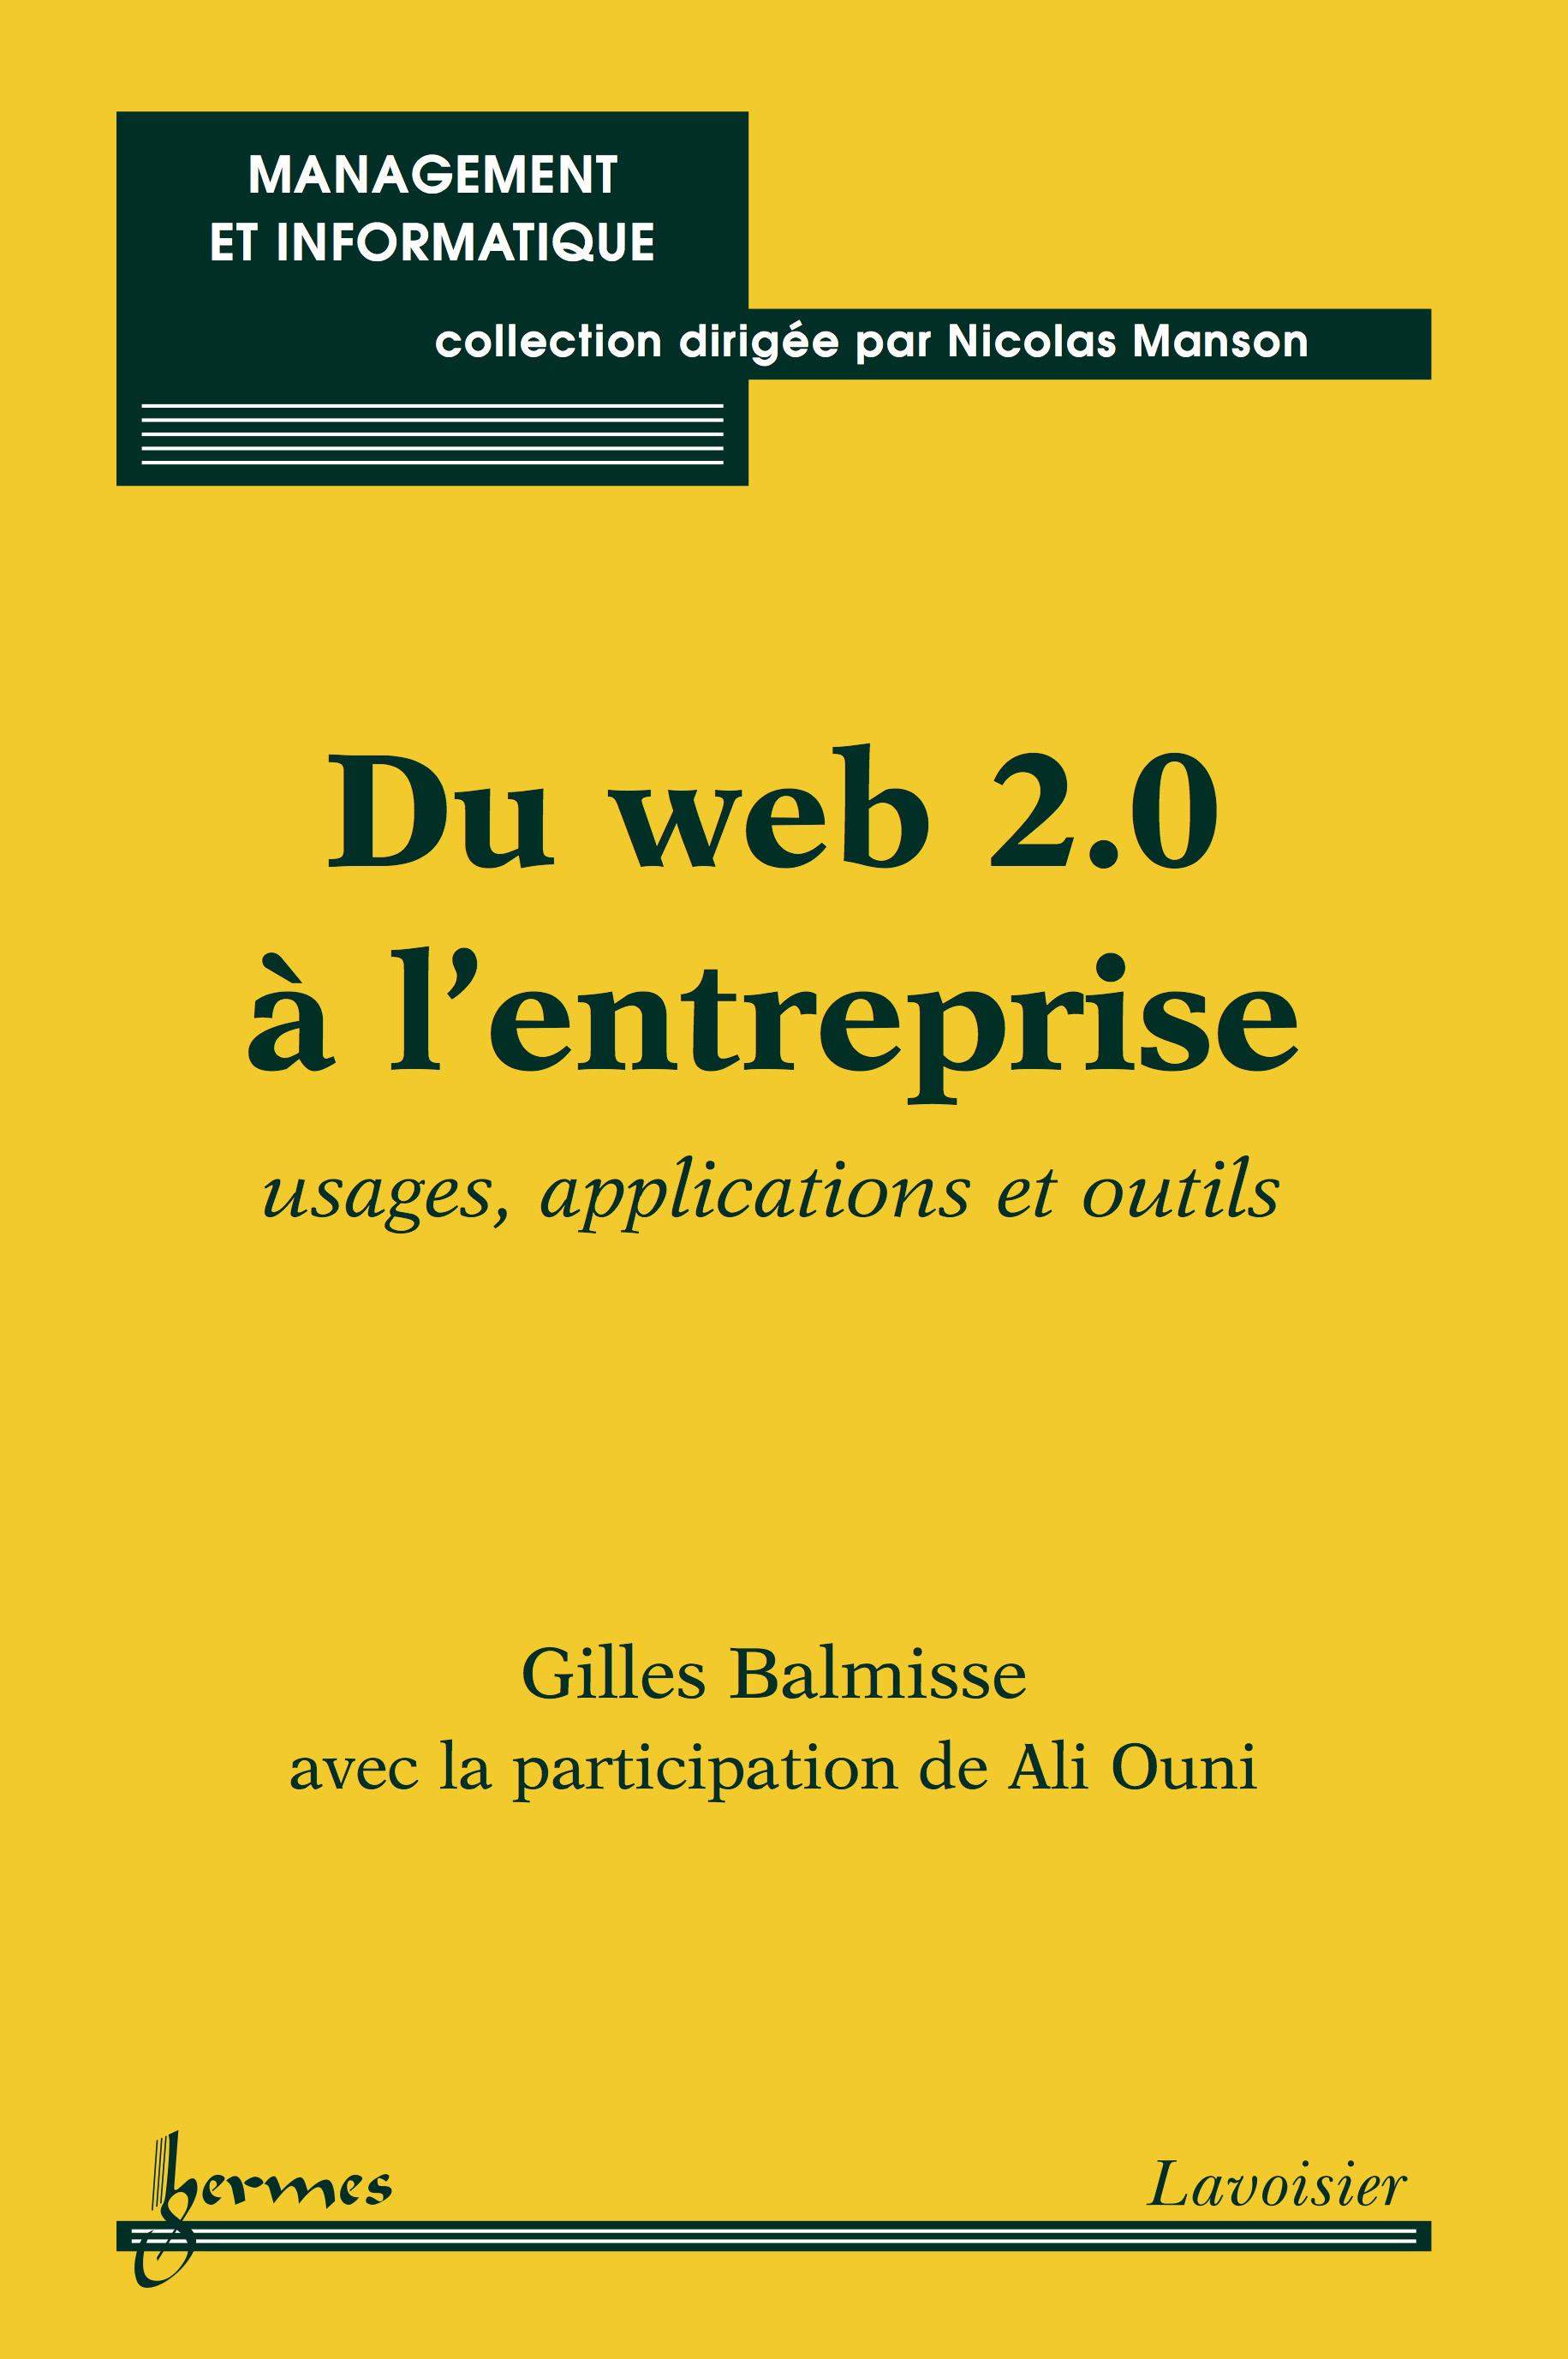 Balmisse (Du web 2.0)